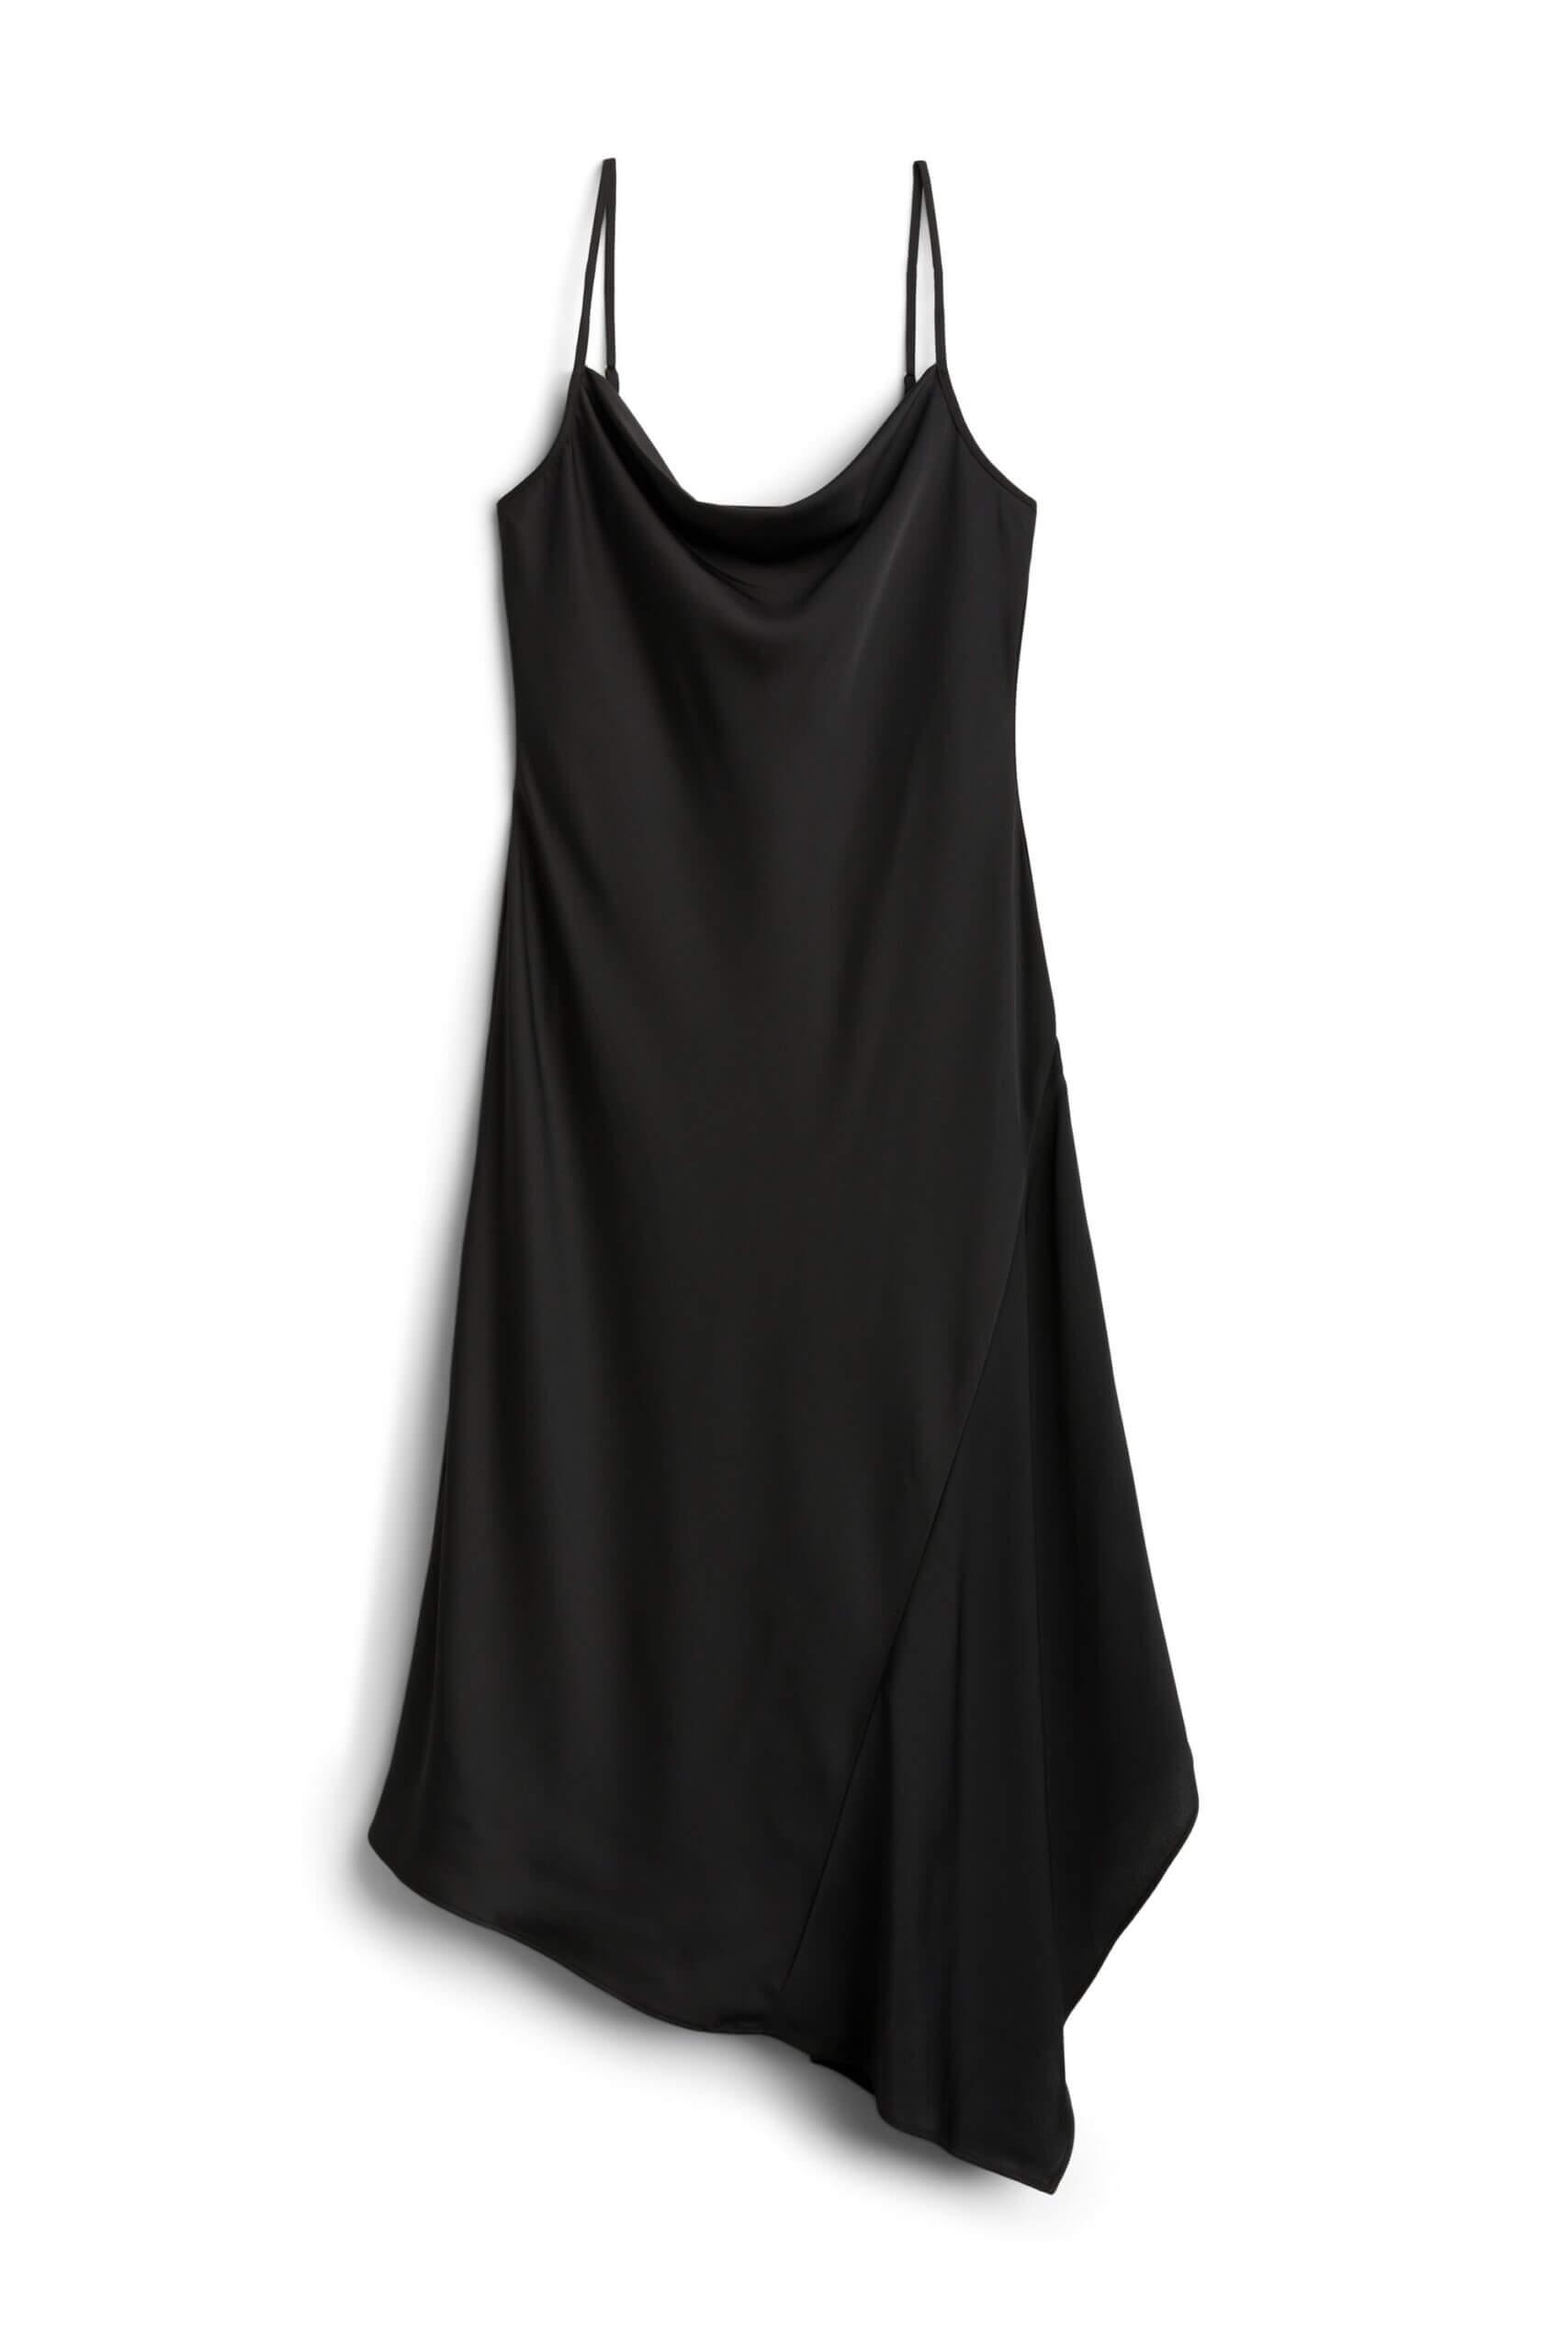 Stitch Fix Women's black sleeveless dress.